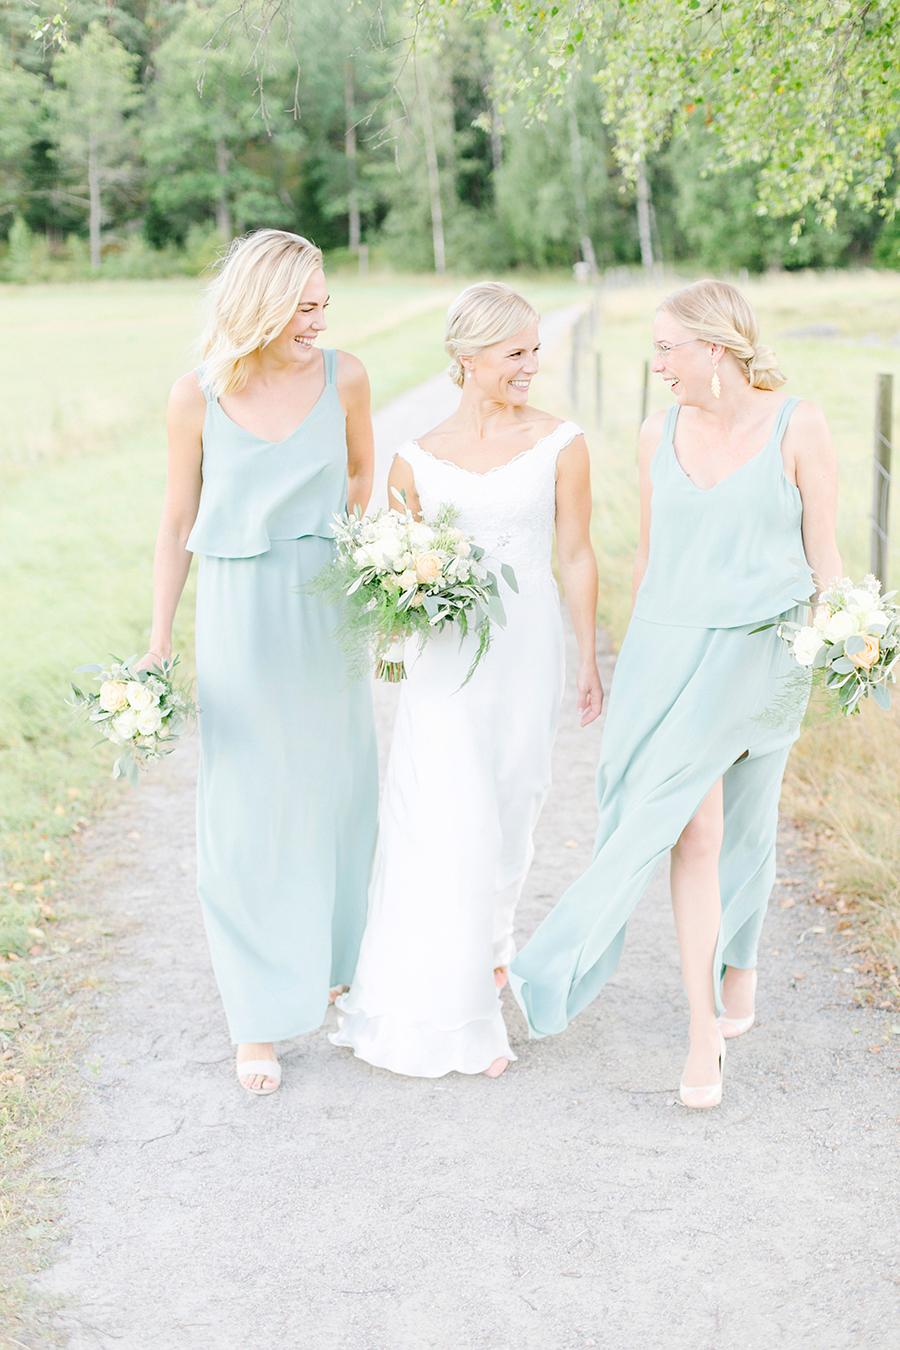 Bröllop Sisters in Law